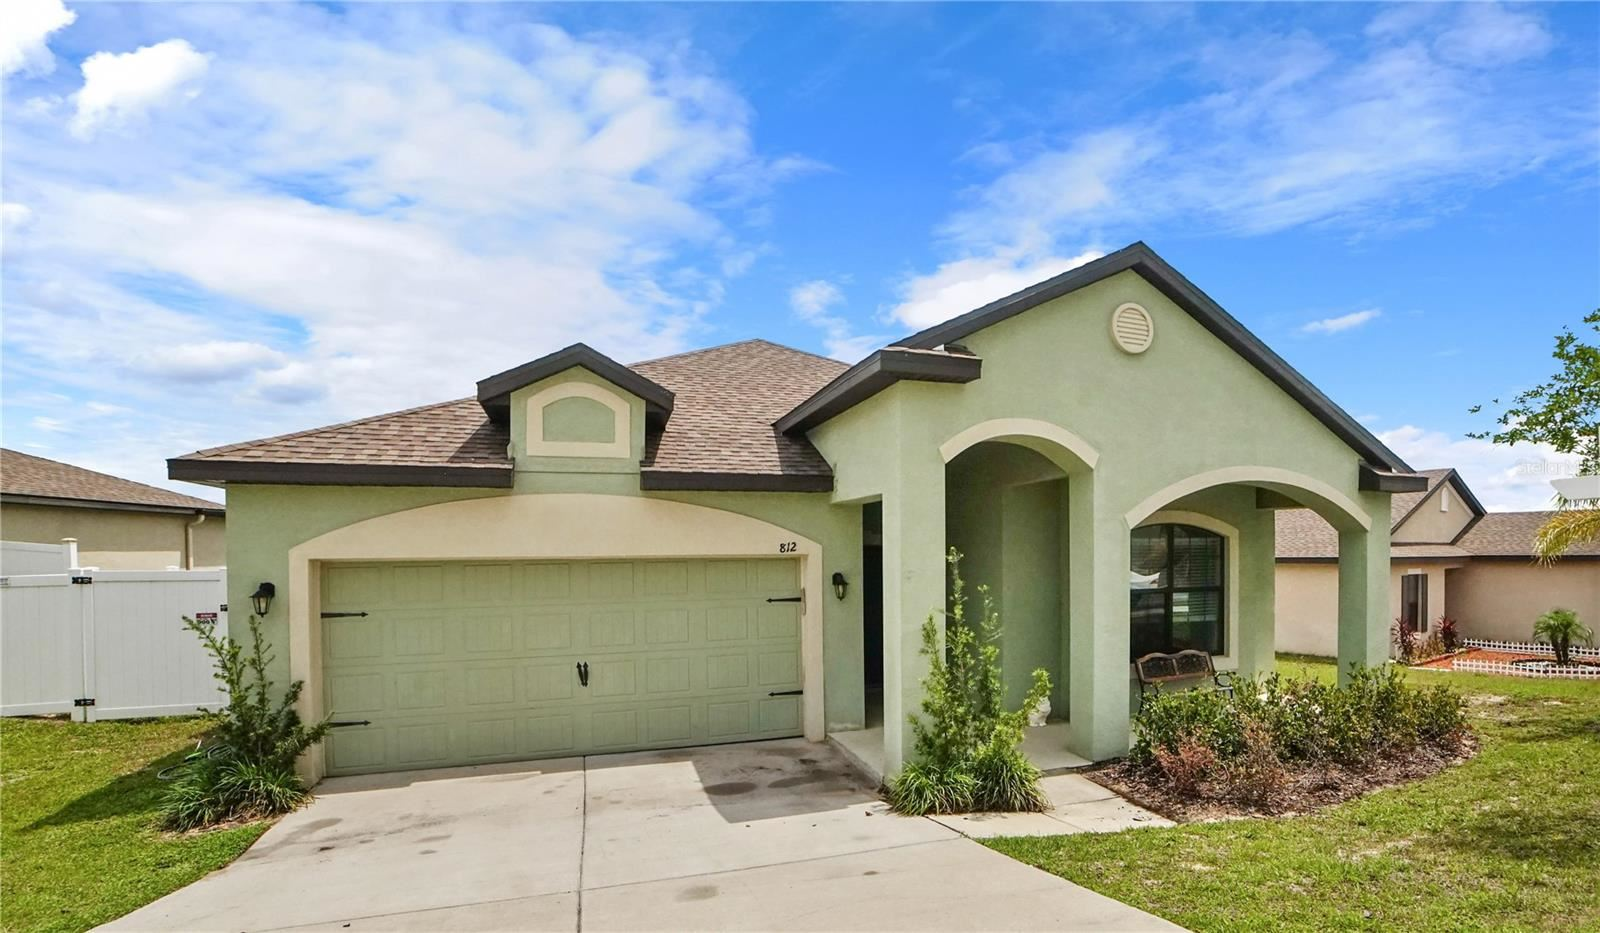 812 LAUREL VIEW WAY, Groveland, FL 34736 - #: O5937646